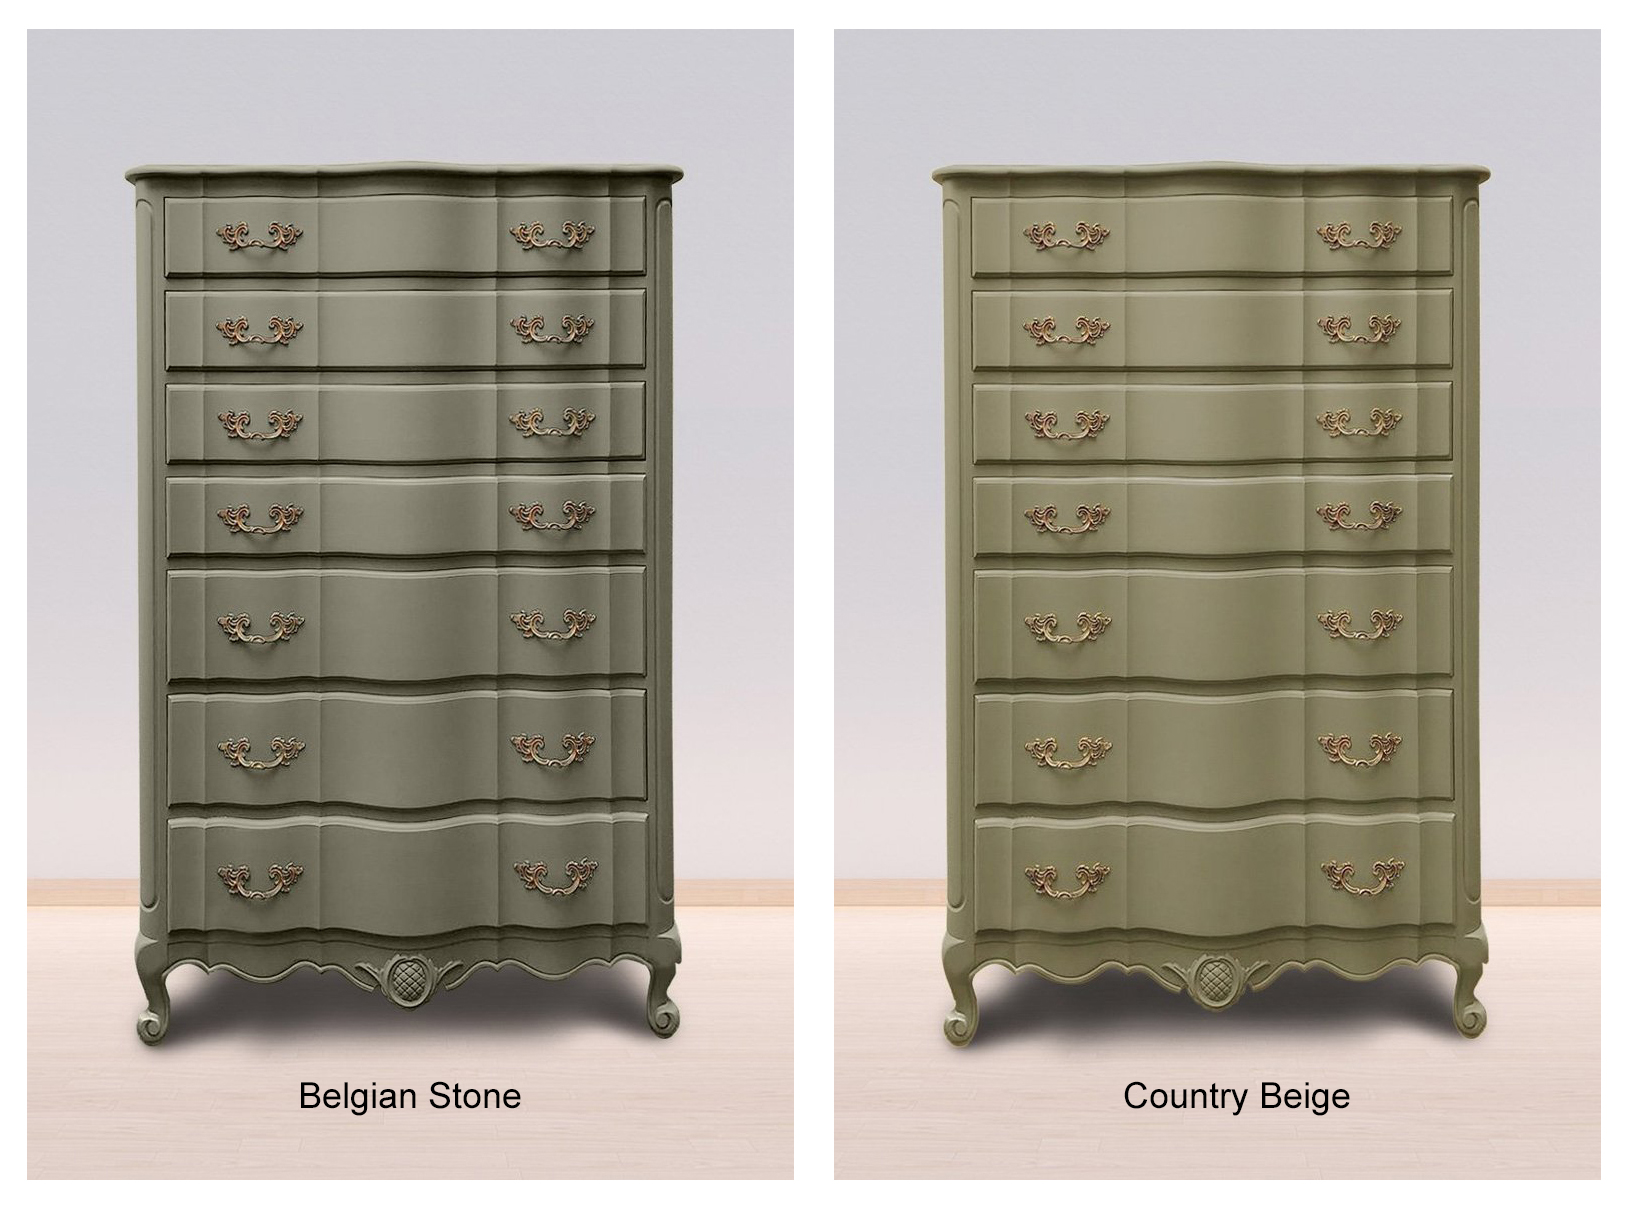 Belgian Stone & Country Beige